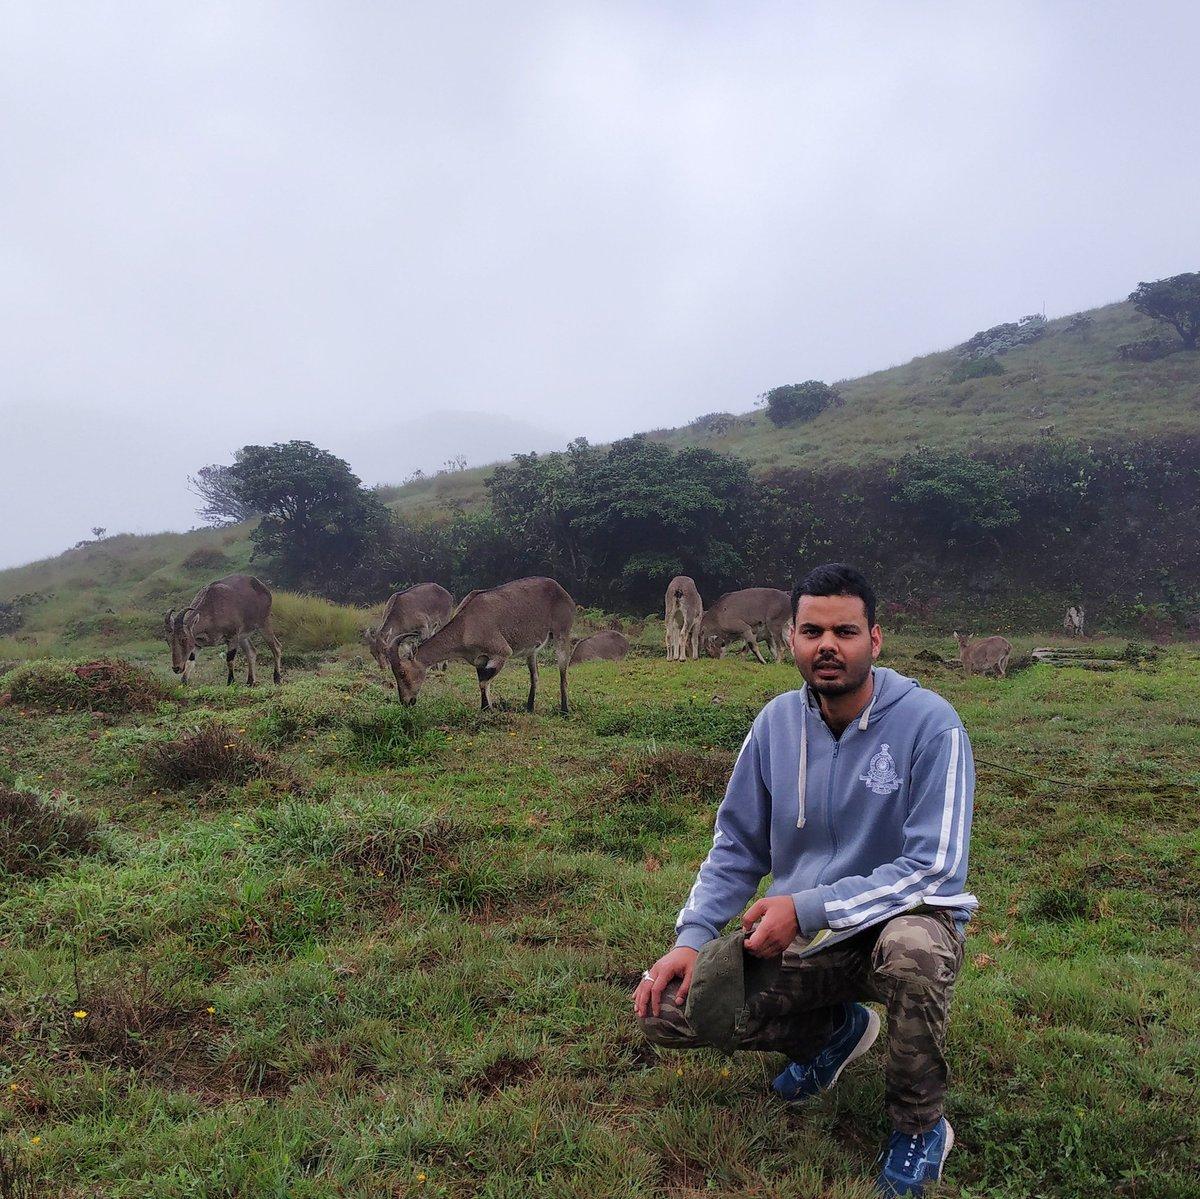 2 days, 40km trek and field inspection in Mukurthi National Park. Lucky to spot endangered Nilgiri Tahr with such close distance. Prized photo 😀  #Nilgiris #nilgiritahr #mukurthi #shola https://t.co/NOf6VVrvlv